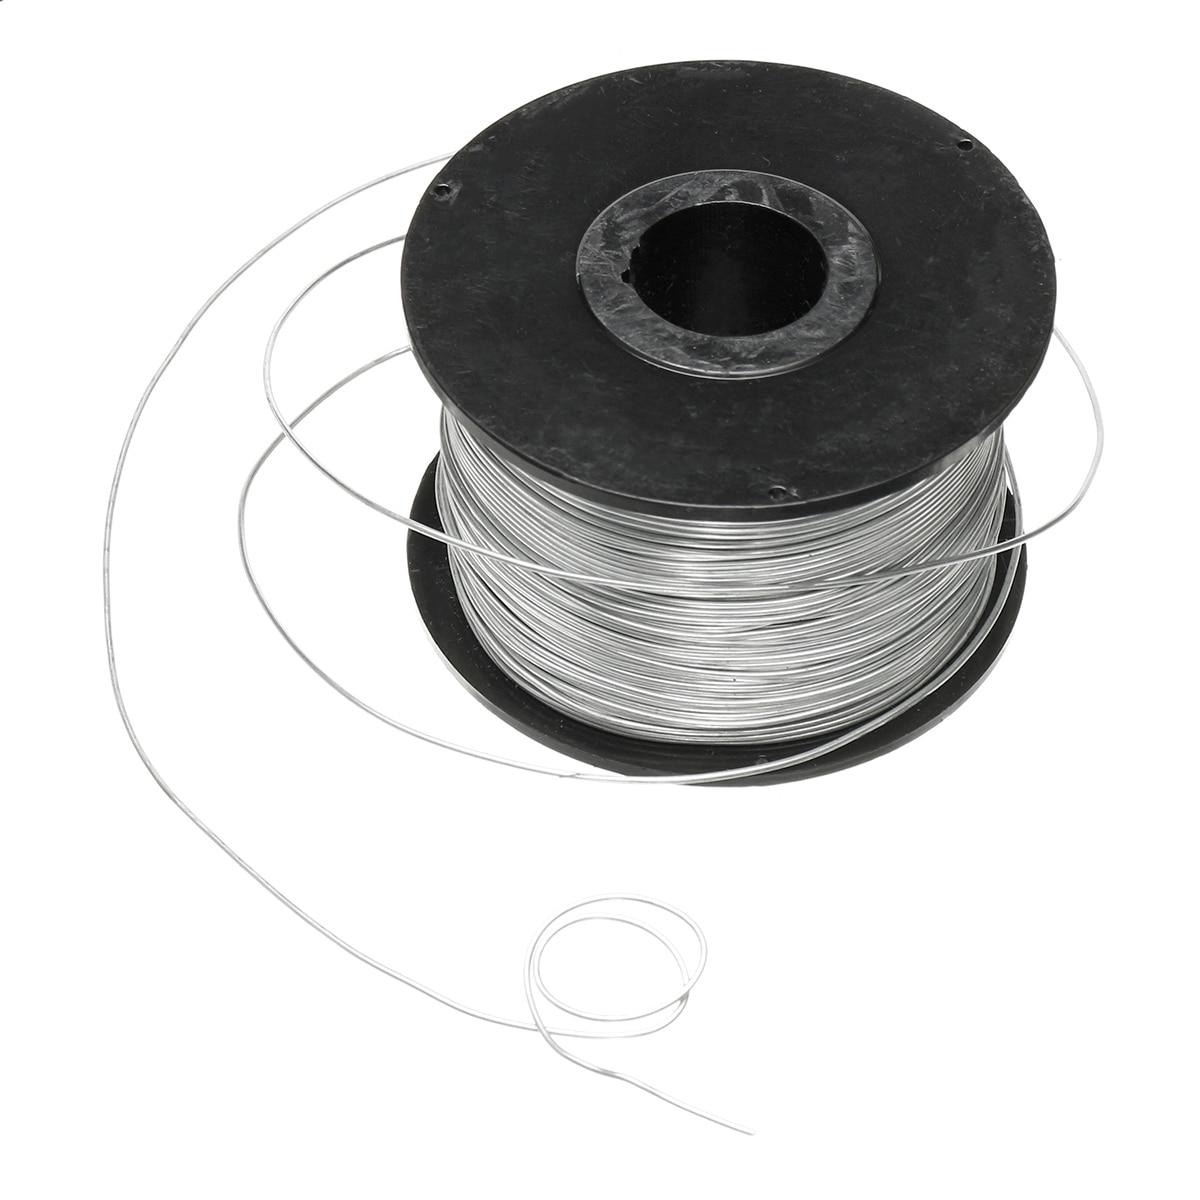 Unique Rebar Tie Wire Adornment - Home Wiring Ideas - racingchange.info